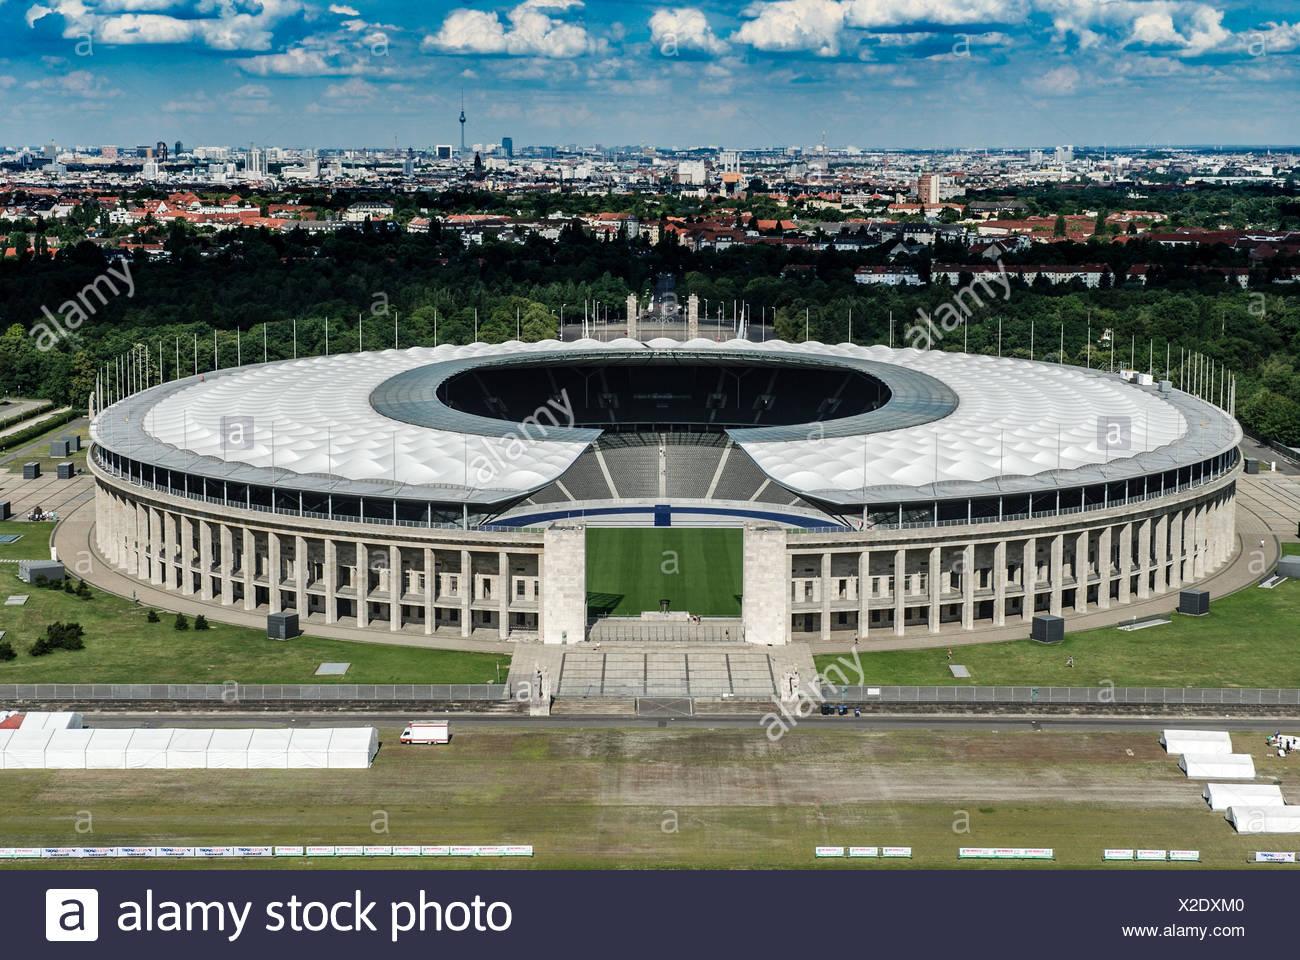 olympiastadion berlin - Stock Image